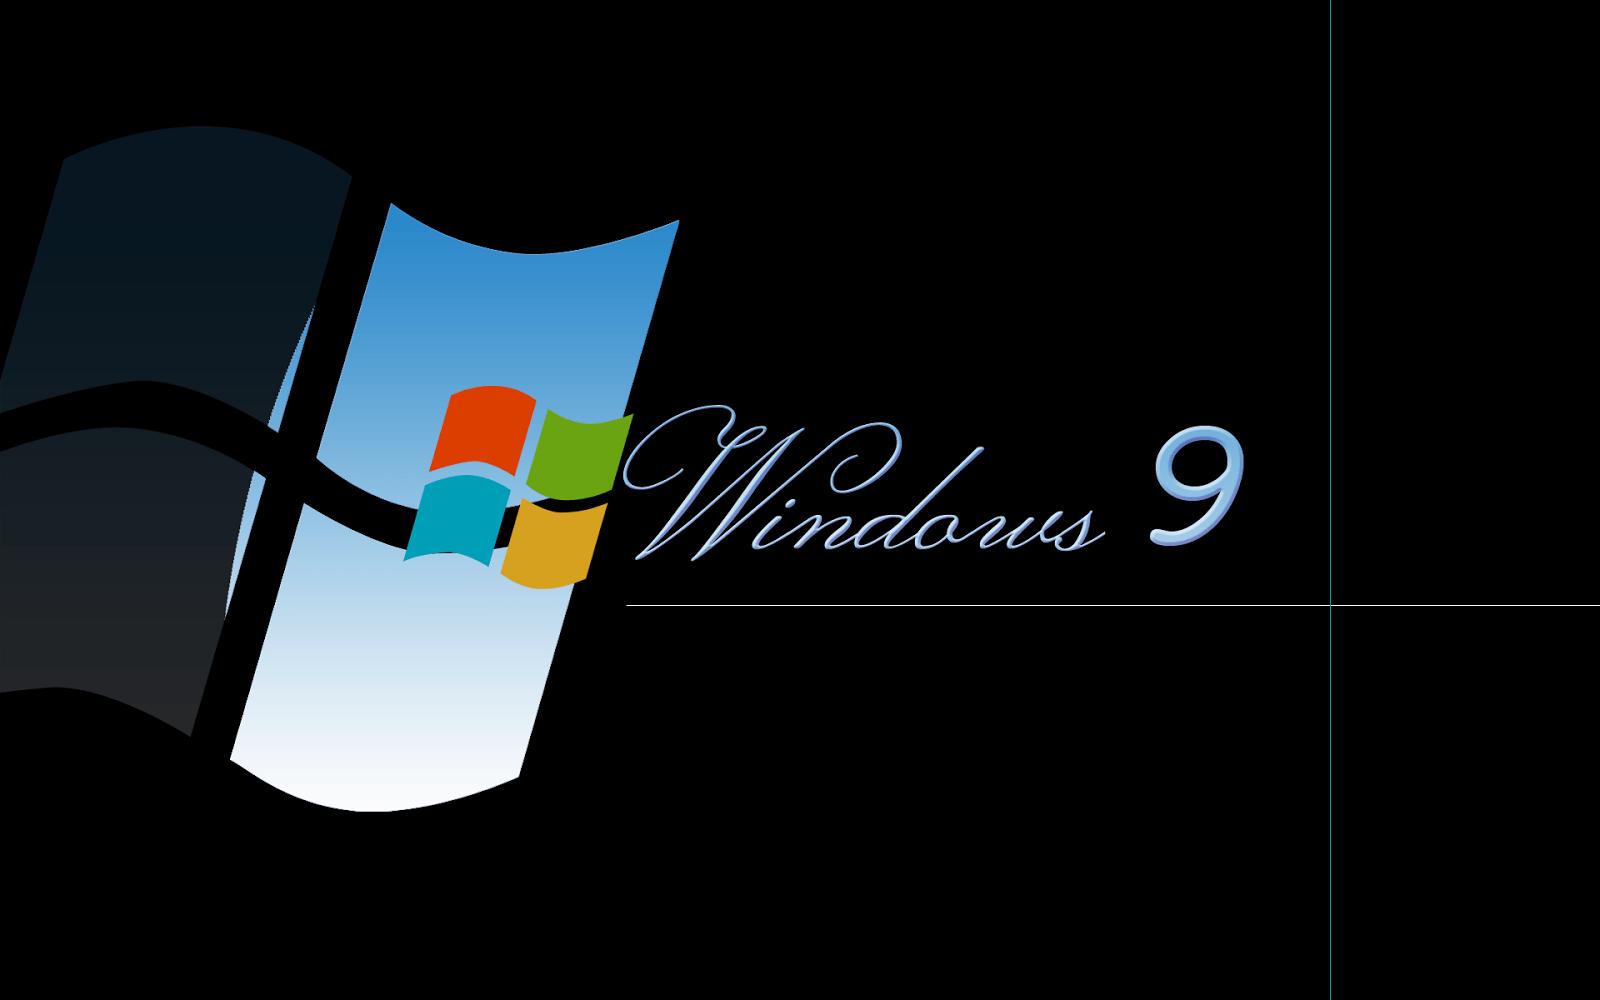 windows 9 full - photo #12